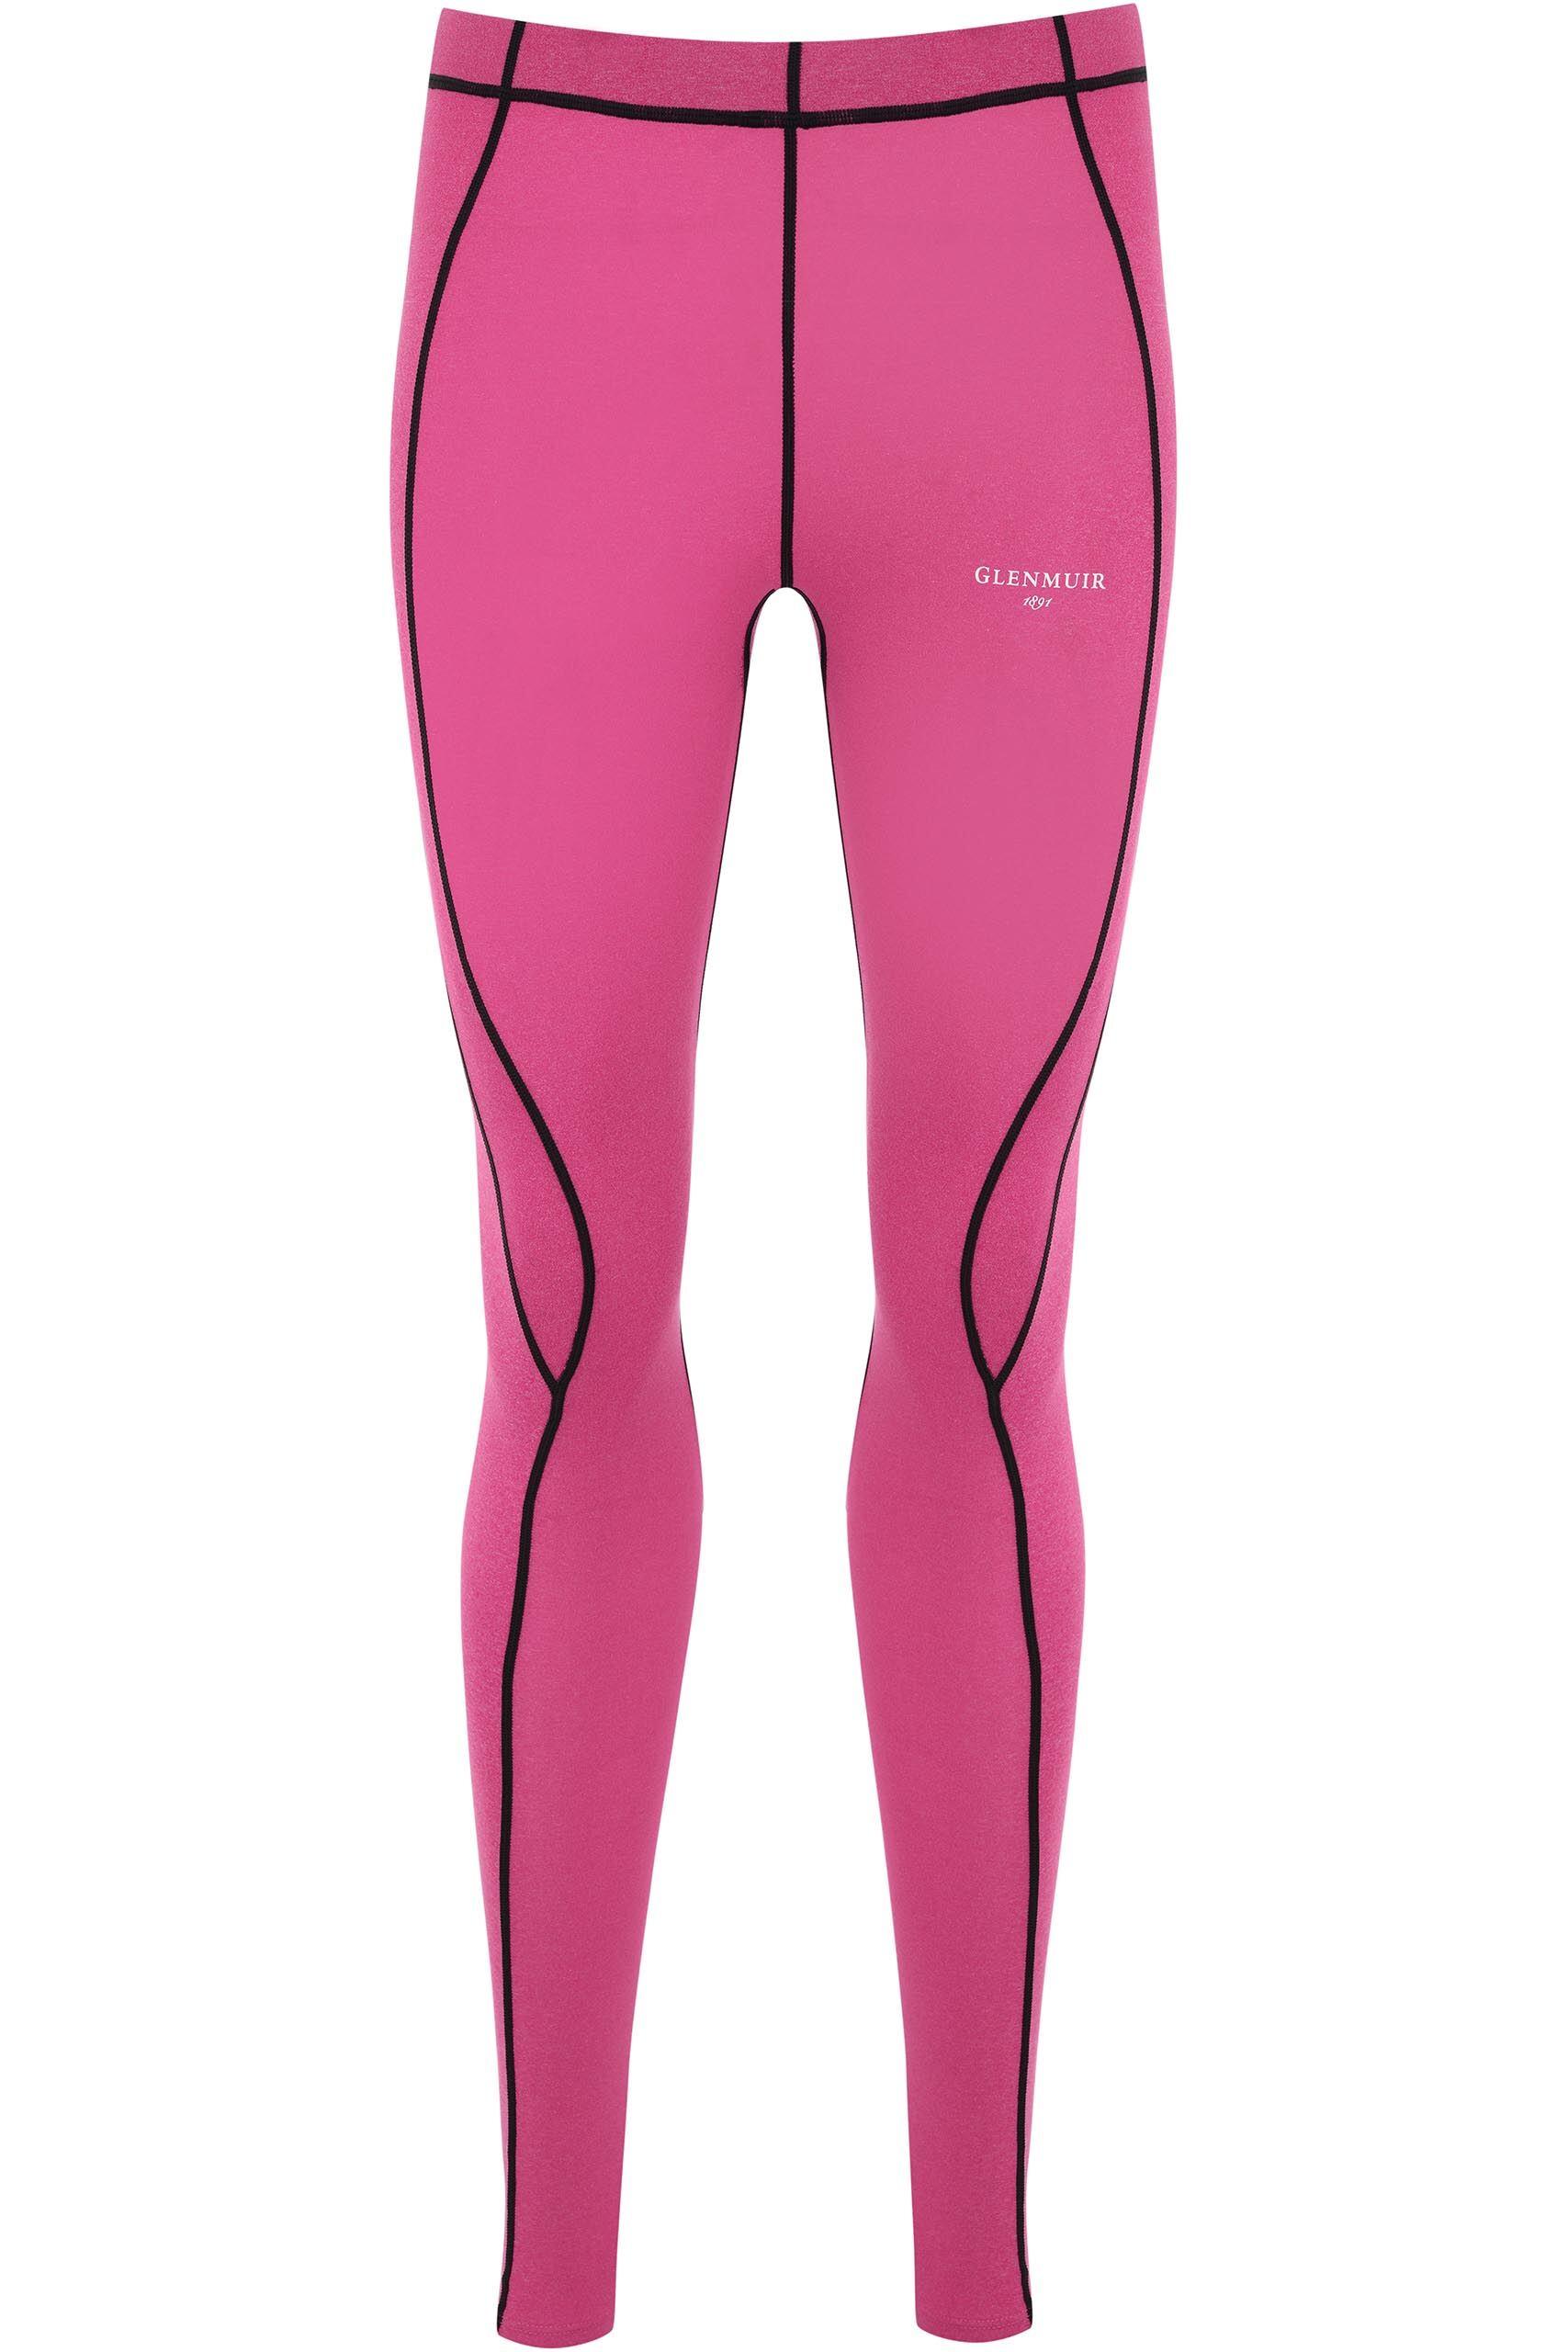 Image of 1 Pack Pink Compression Base Layer Leggings Ladies 10-12 Ladies - Glenmuir